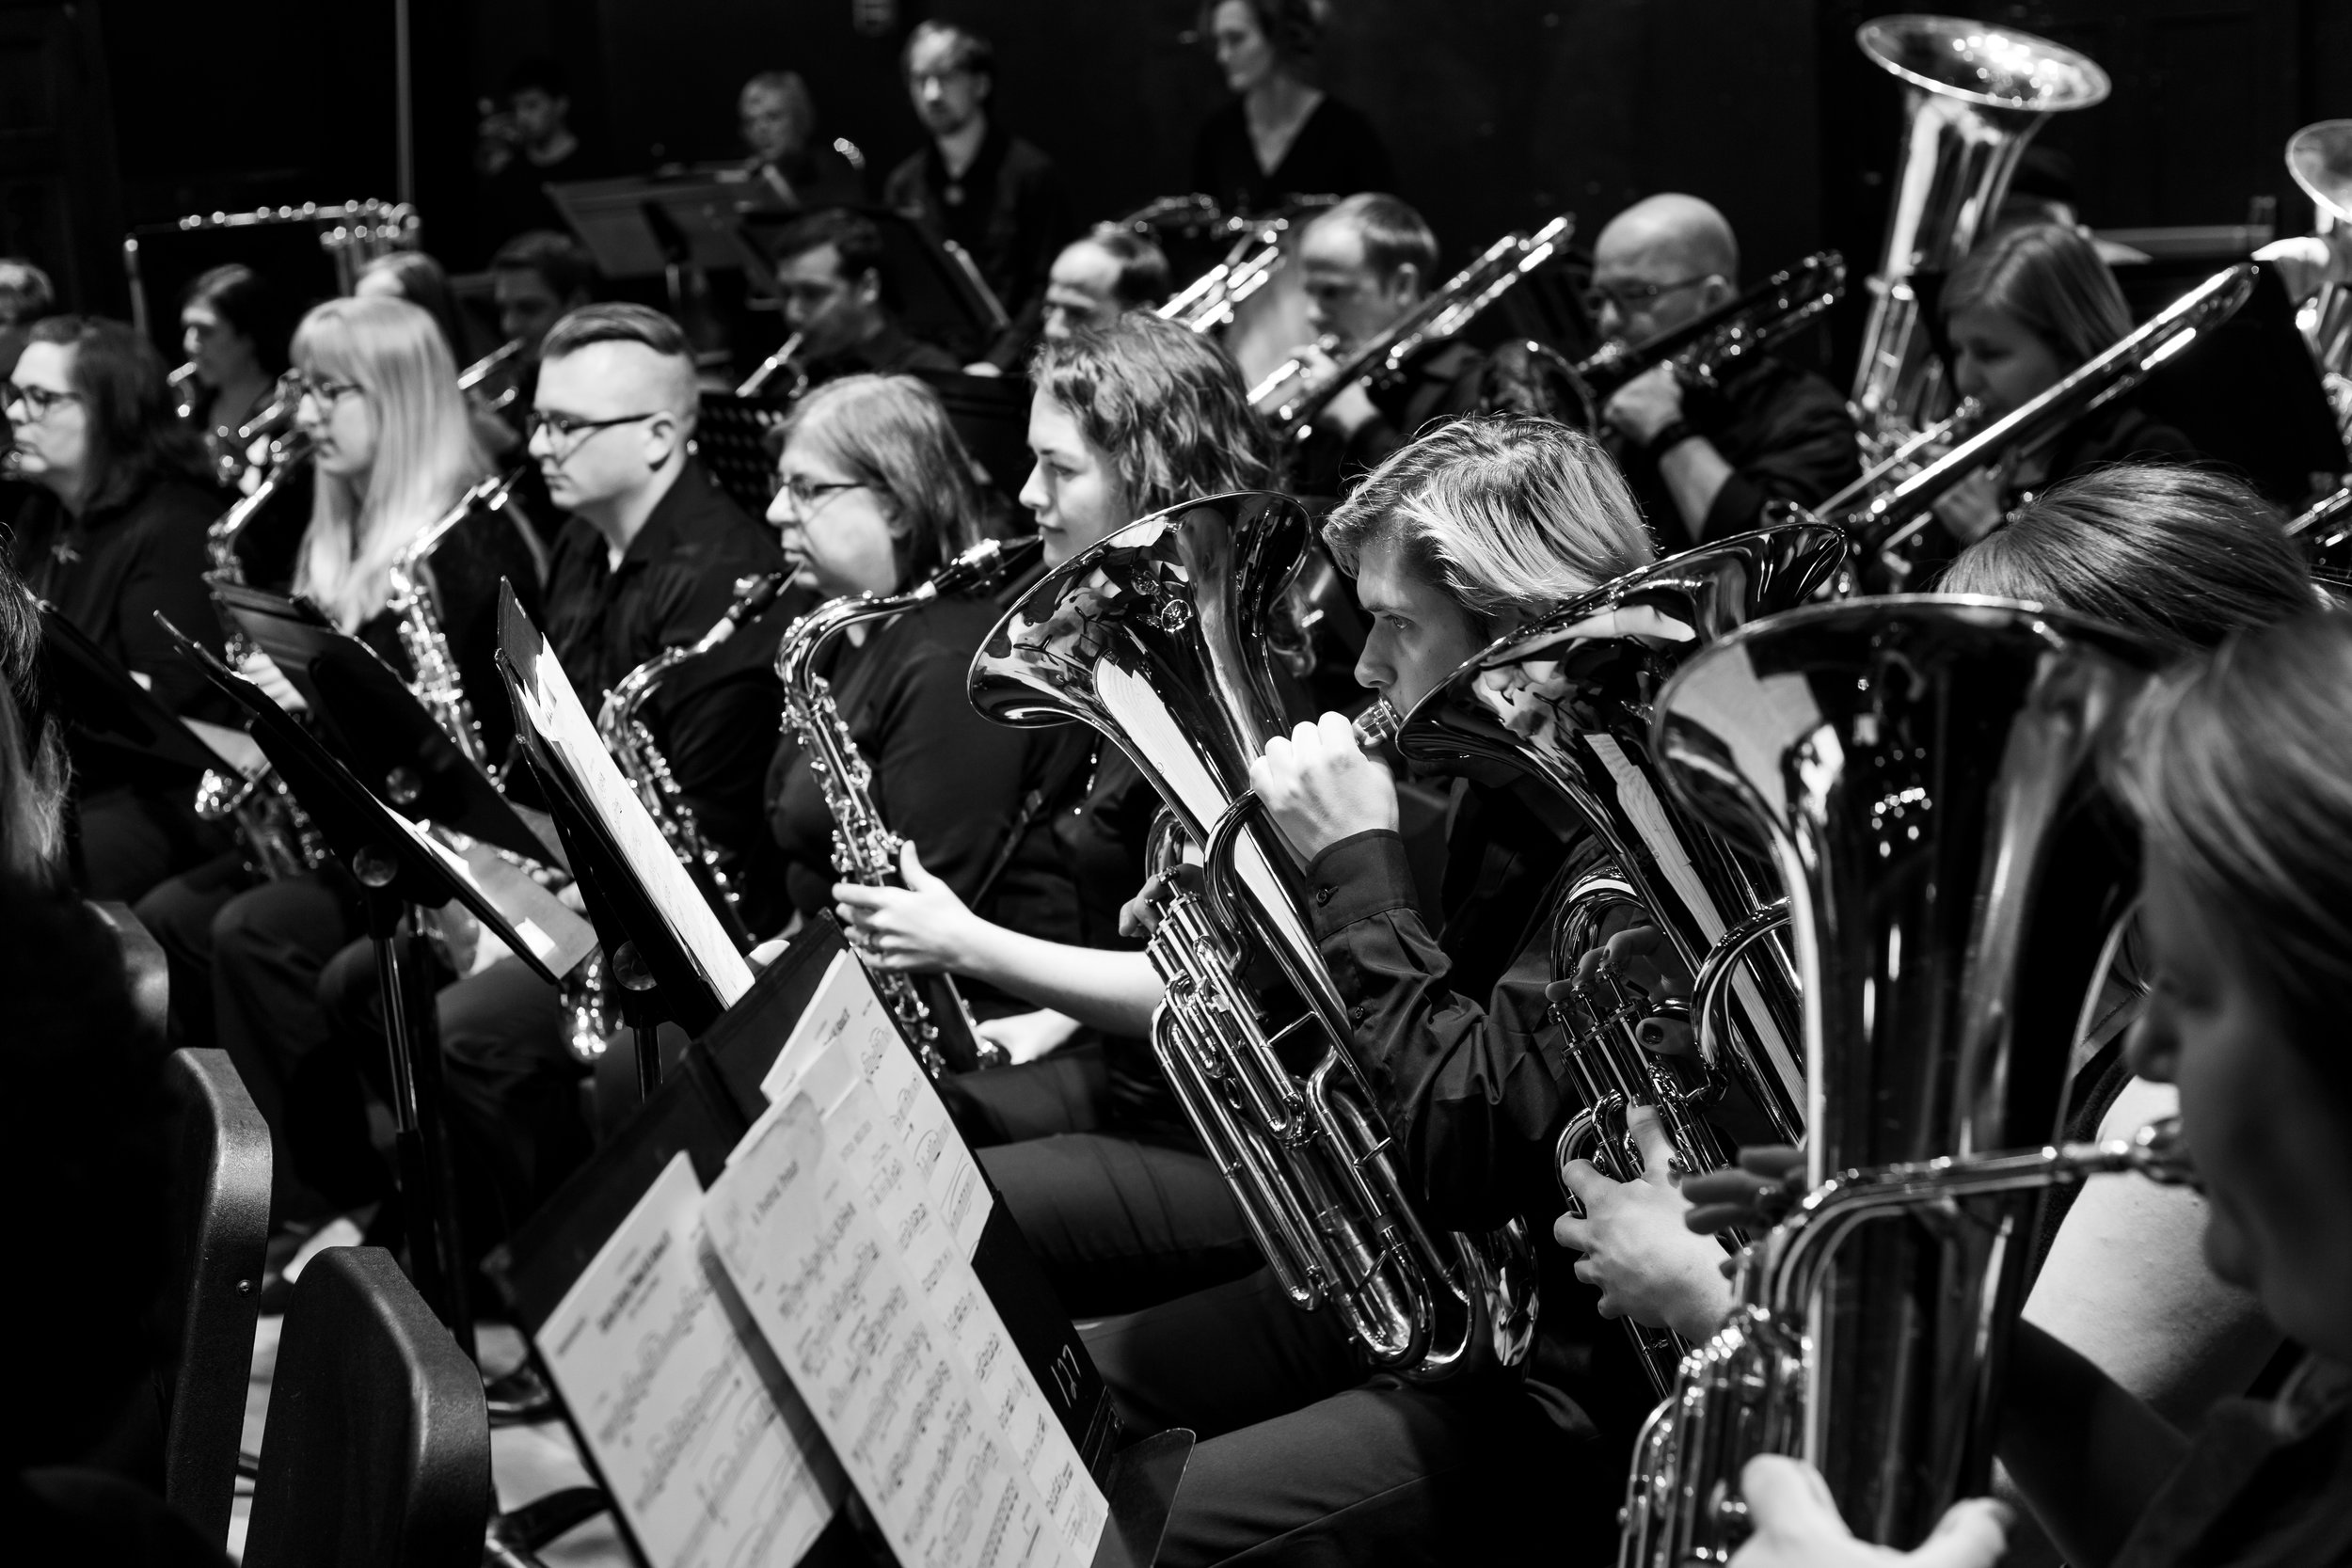 Orchestra-12.jpg